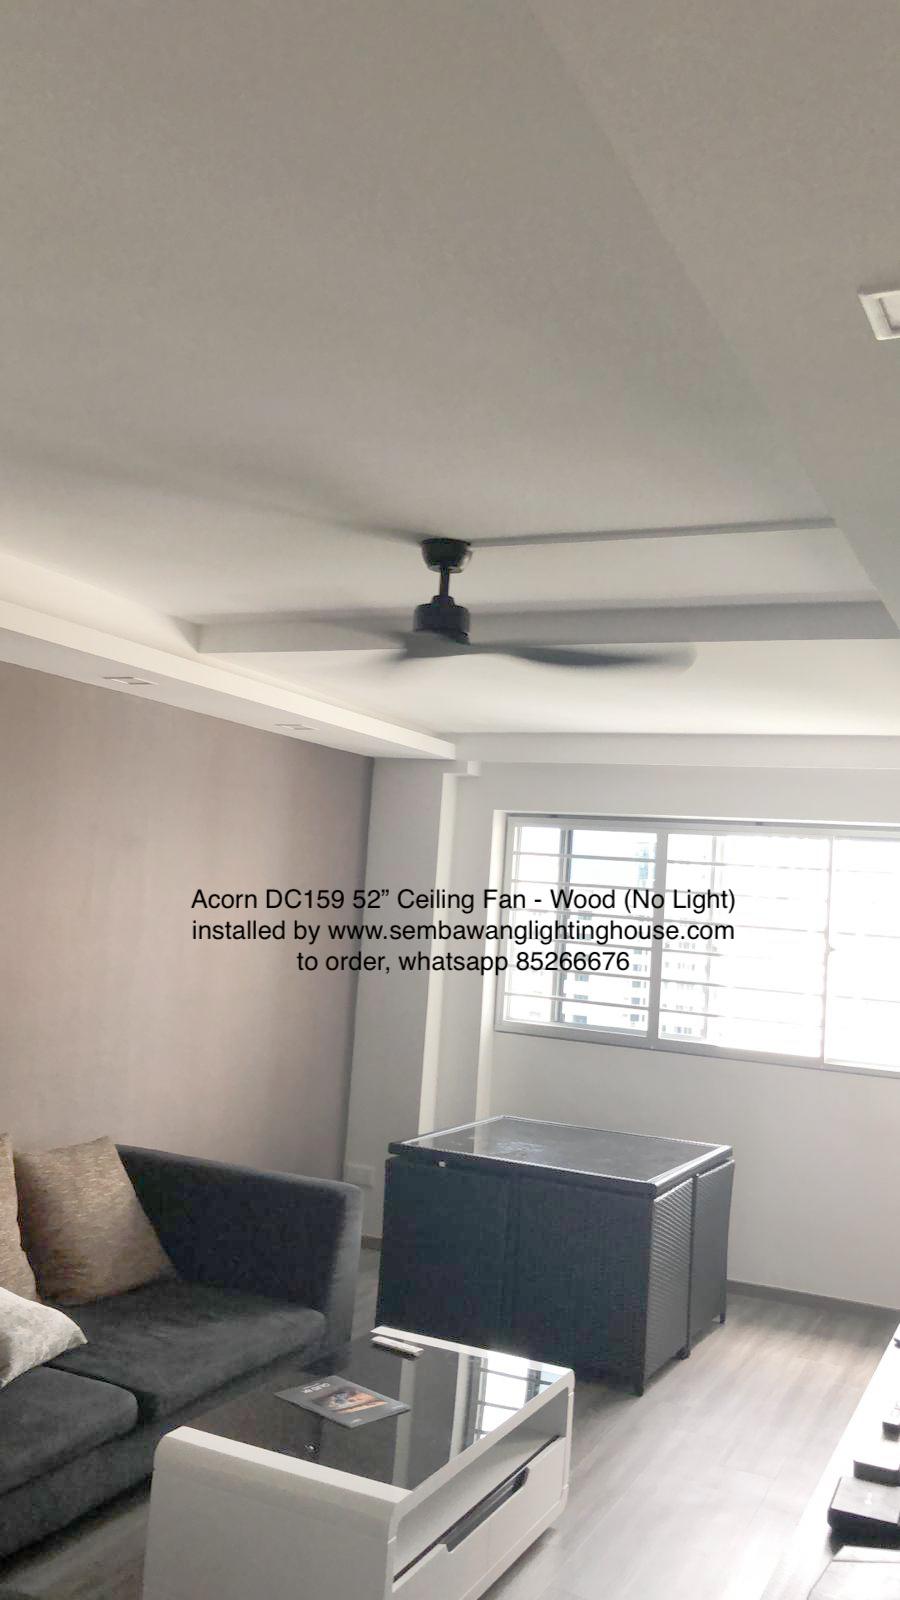 sample04-acorn-dc159-52-22-ceiling-fan-no-light-wood-sembawang-lighting-house.jpeg